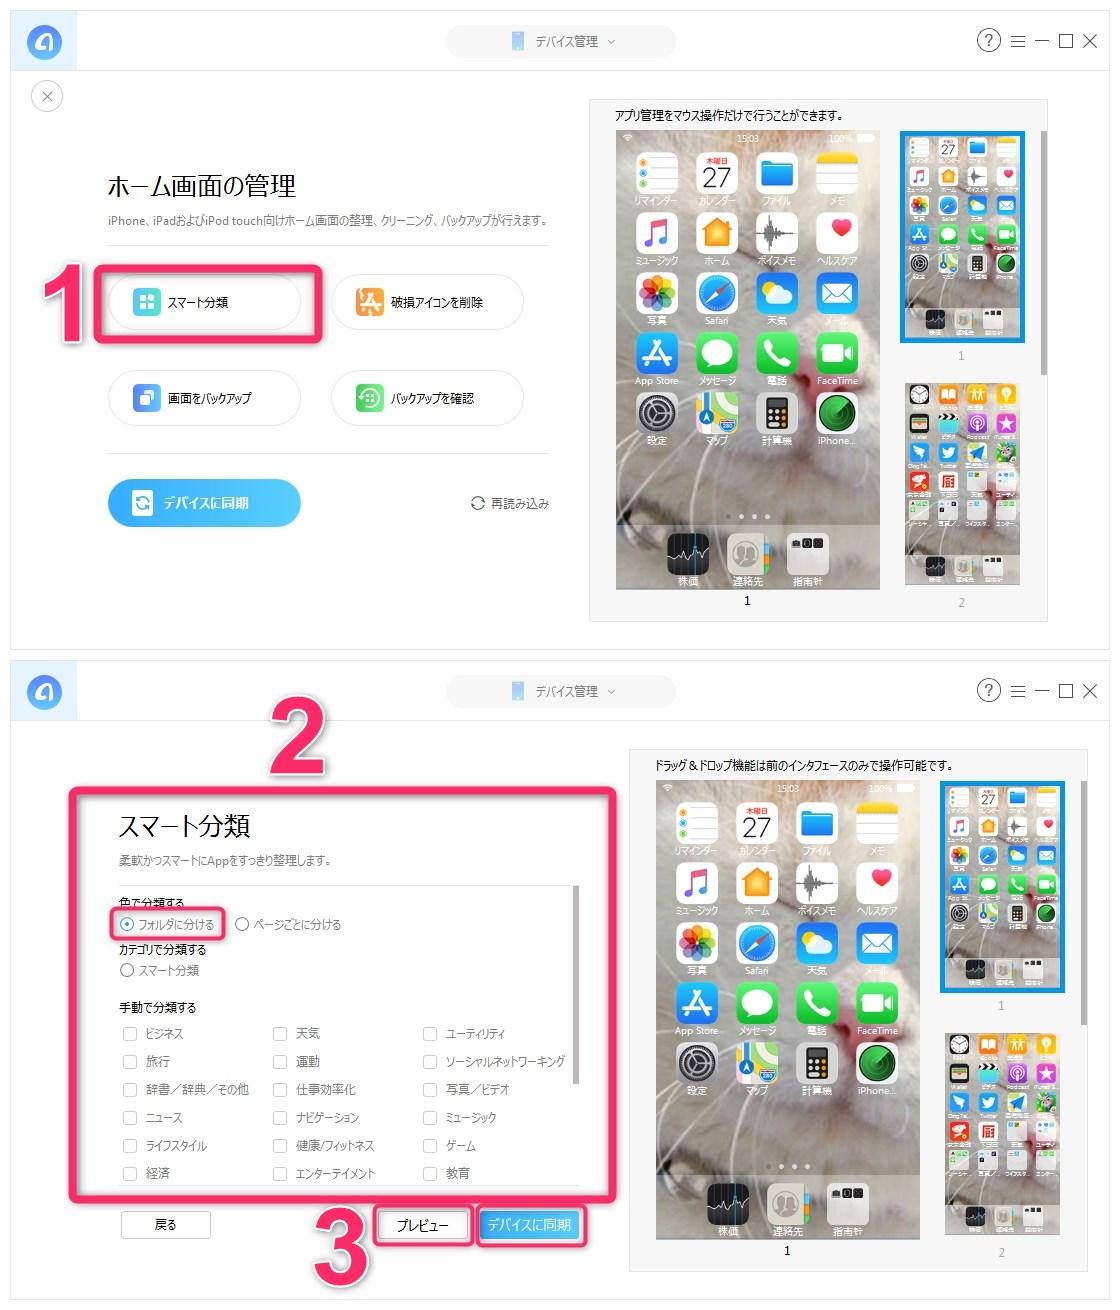 iPhoneのホーム画面を改造/アプリを分類する方法